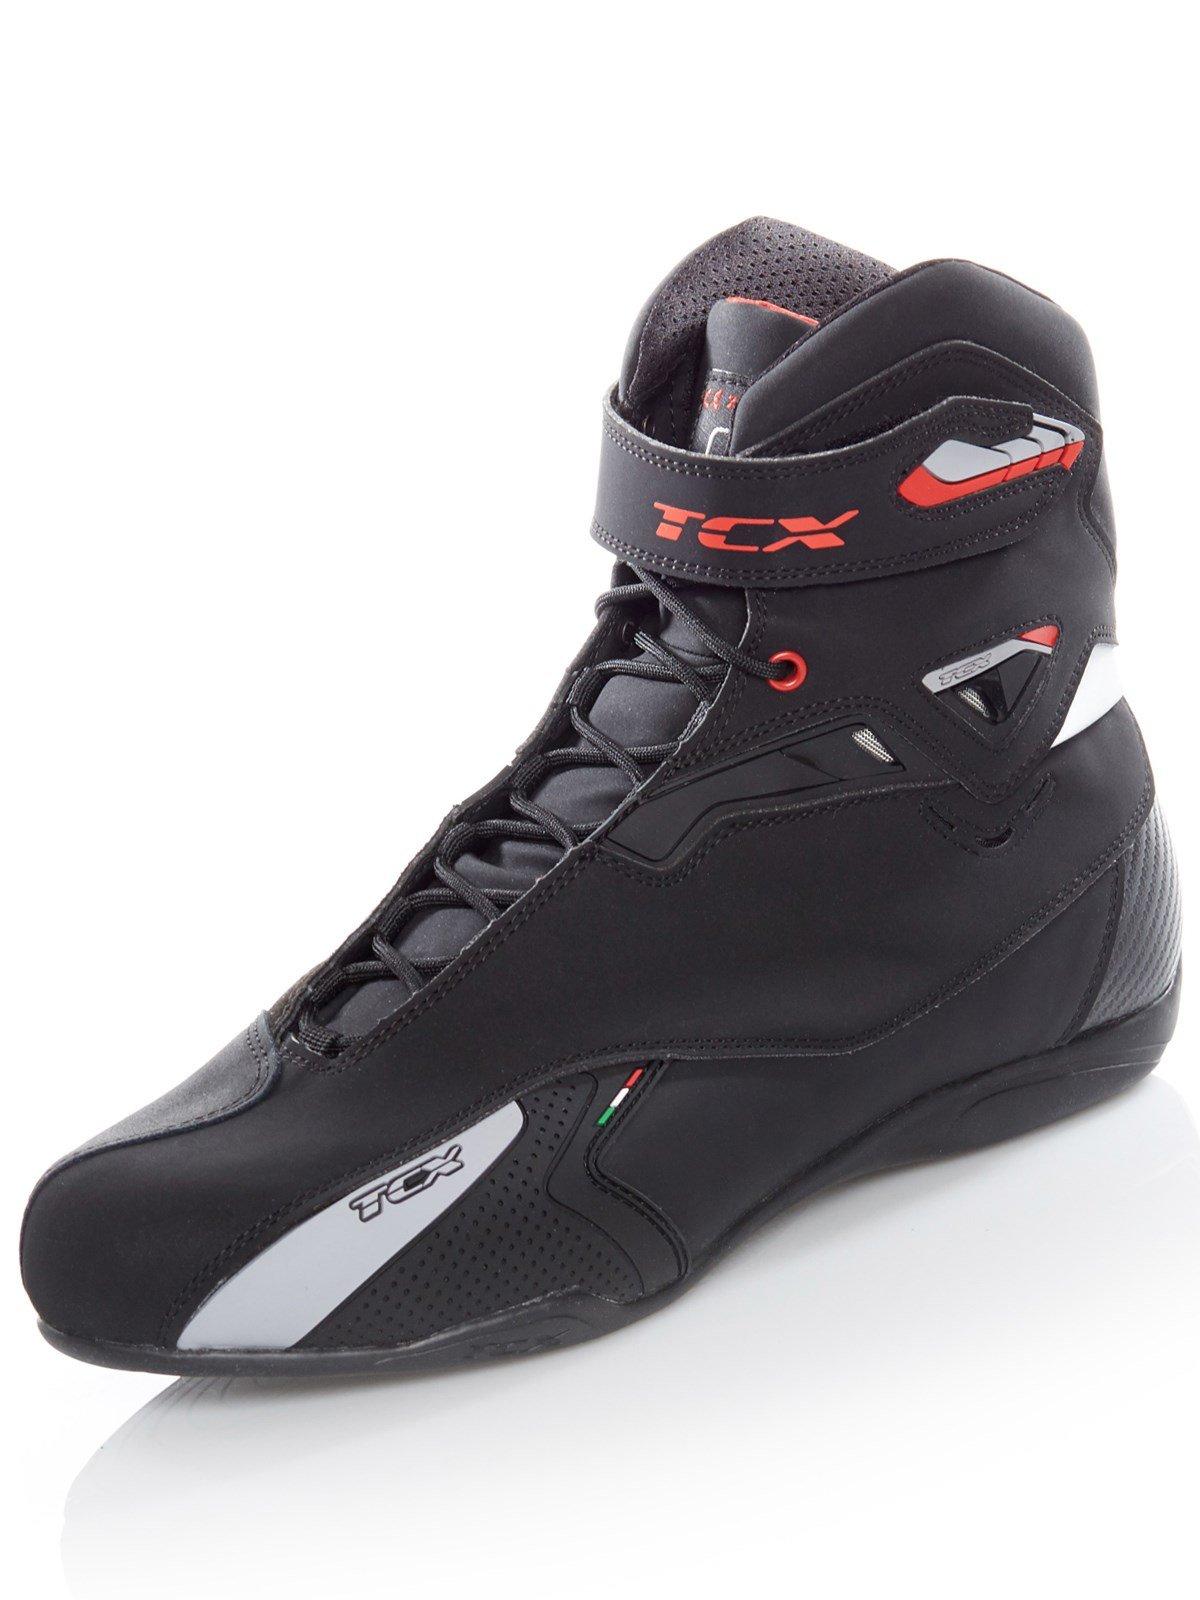 TCX Rush Waterproof Mens Street Boots W/P Black 41 EUR/8 USA